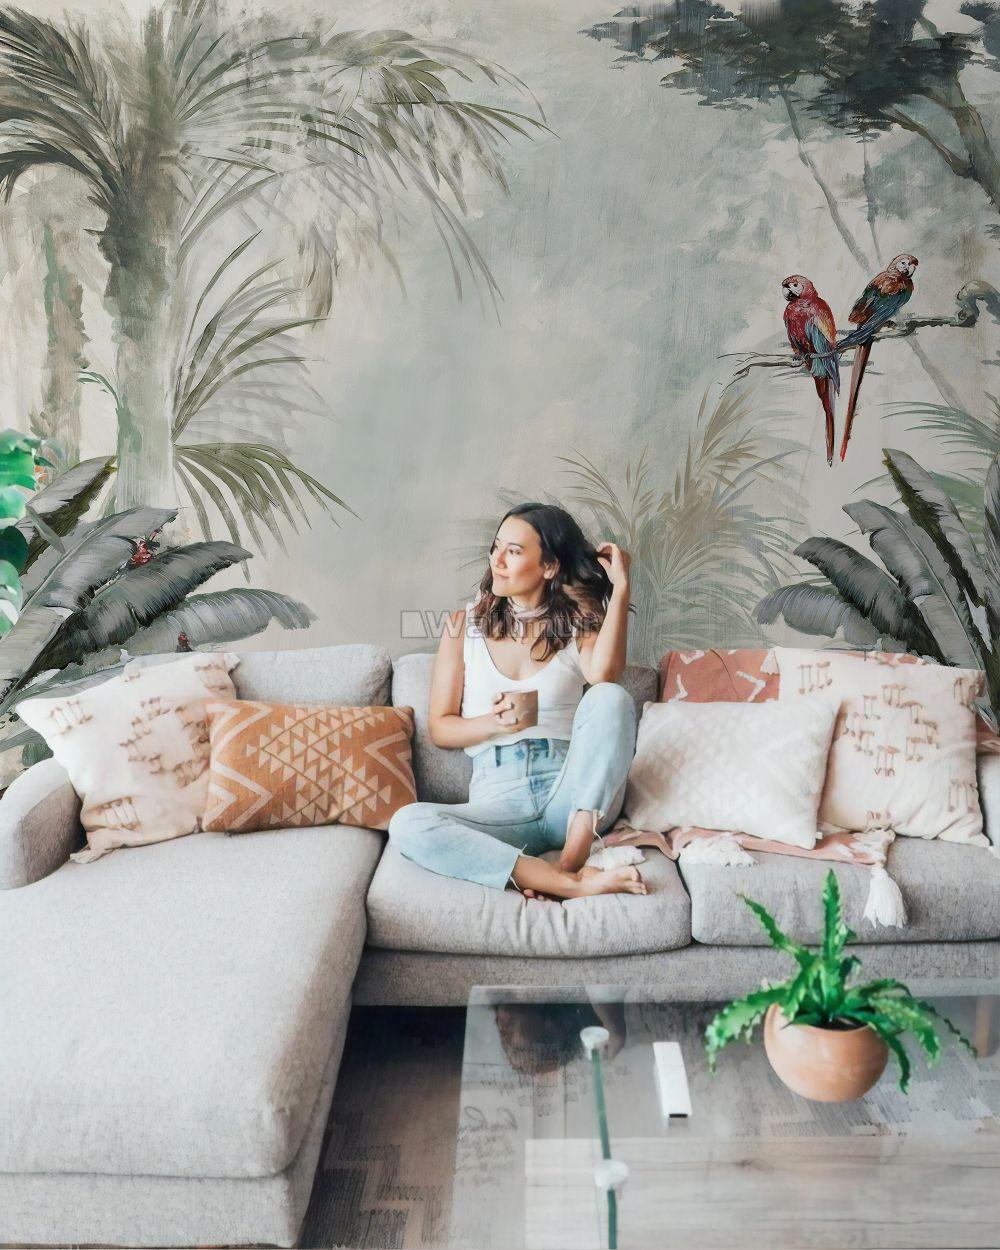 Tree Design Wallpaper Living Room: Tropical Trees Wallpaper Mural в 2020 г